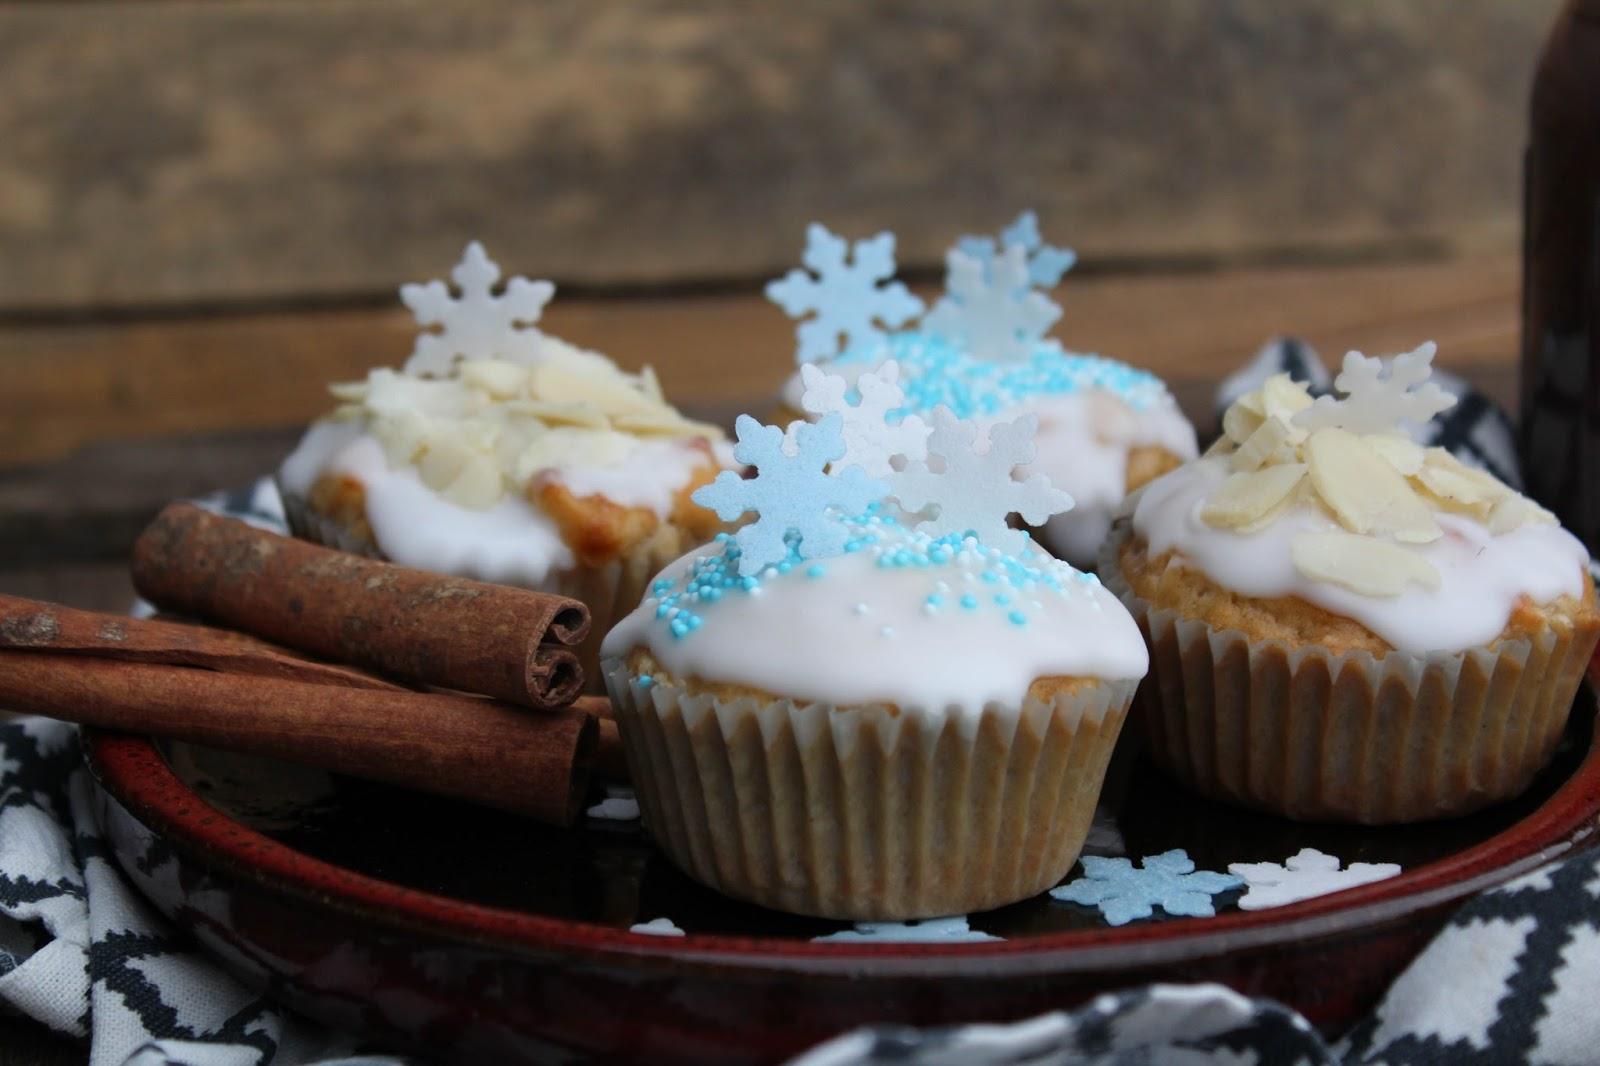 winterliche apfel mandel muffins mit zimt hei e zimt schokolade victoria 39 s little secrets. Black Bedroom Furniture Sets. Home Design Ideas